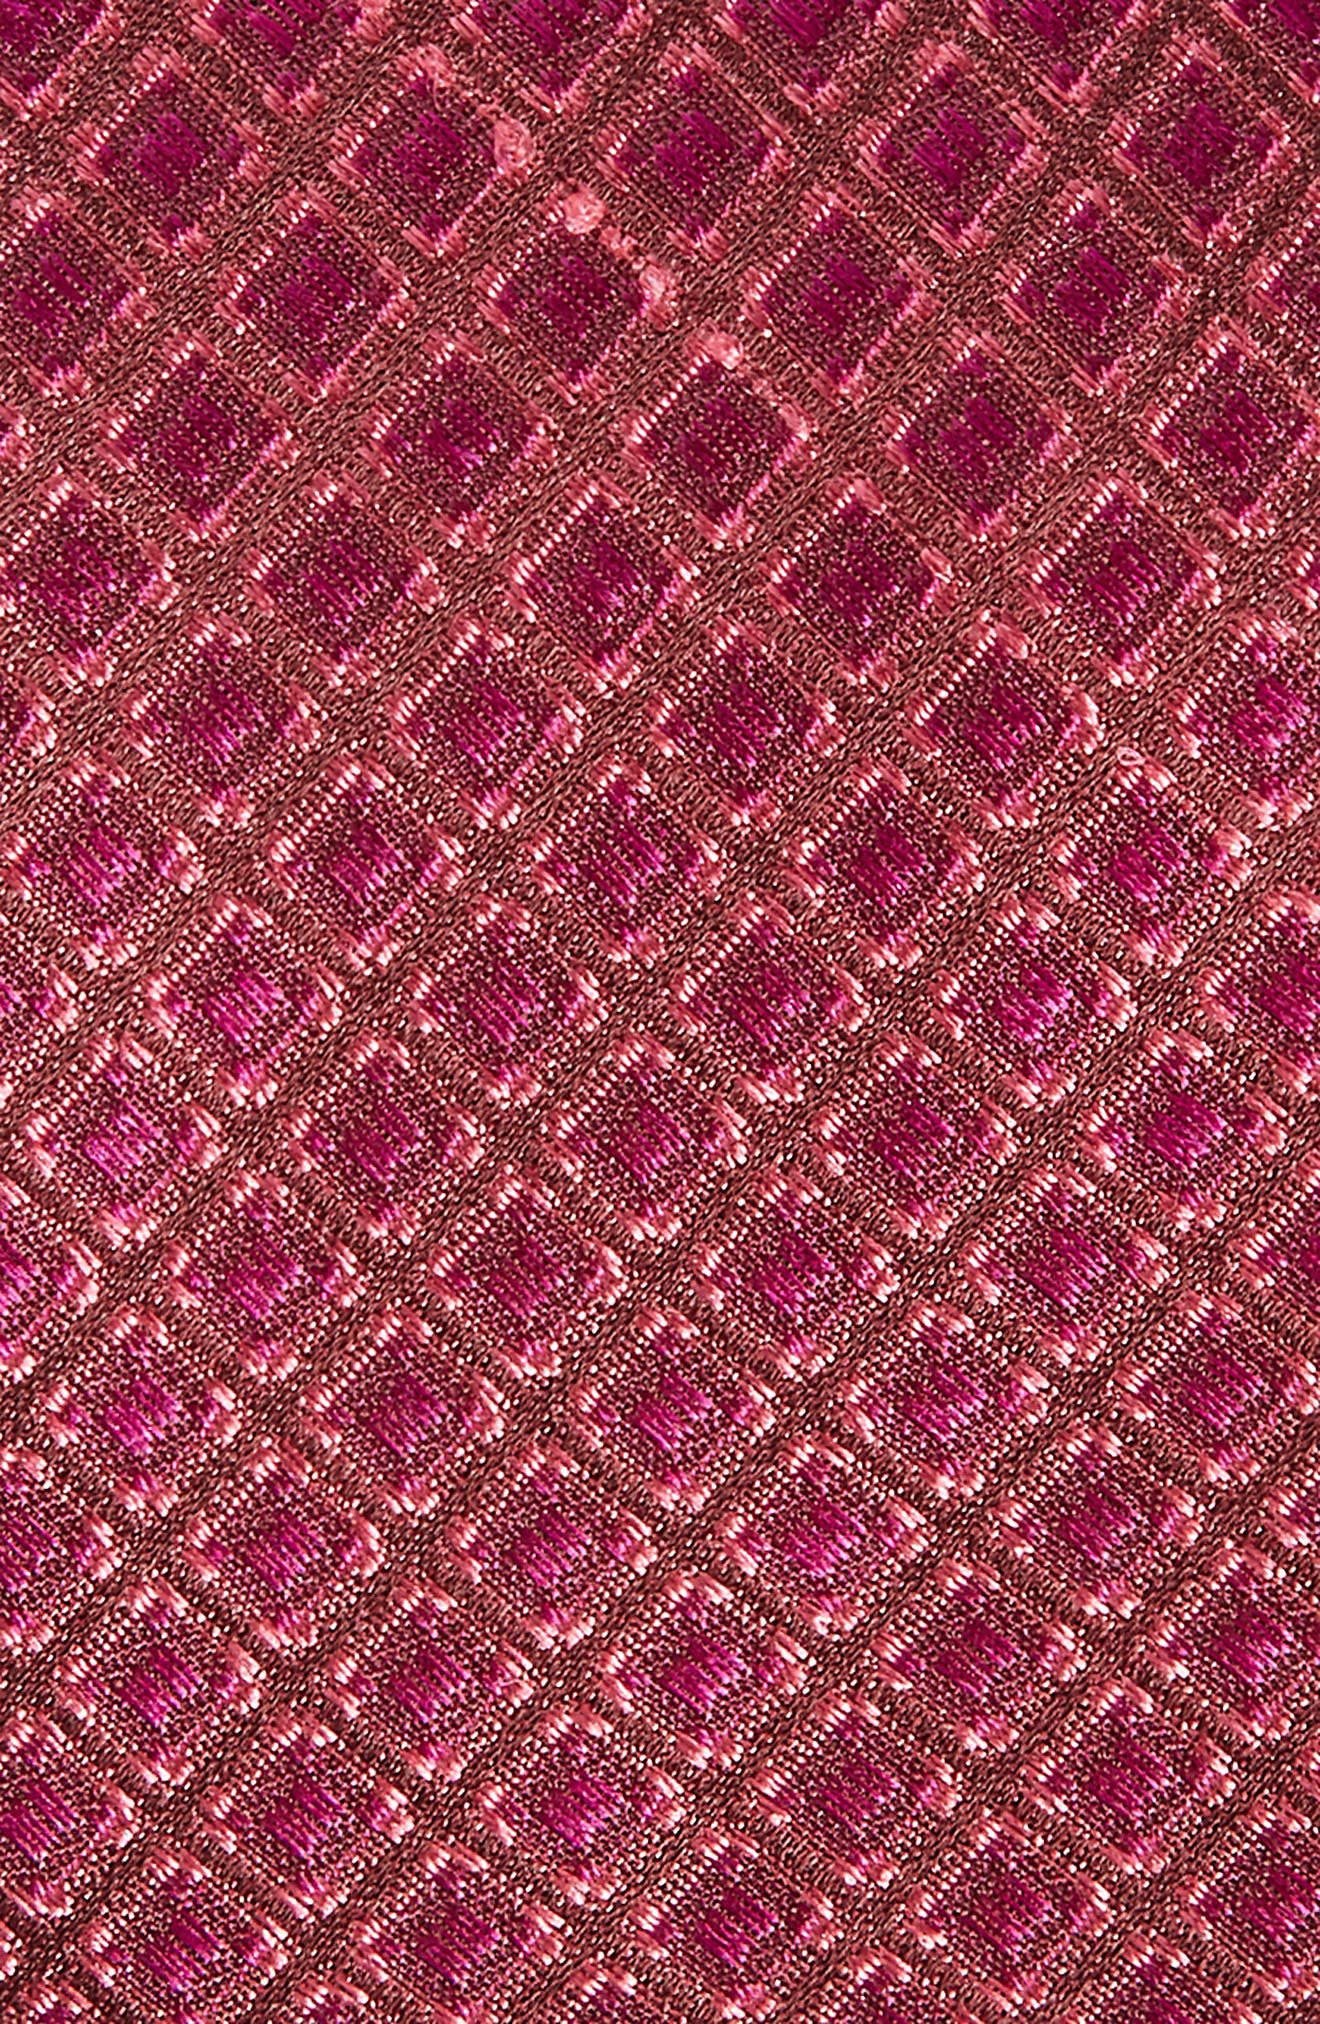 Denberg Check Silk Tie,                             Alternate thumbnail 8, color,